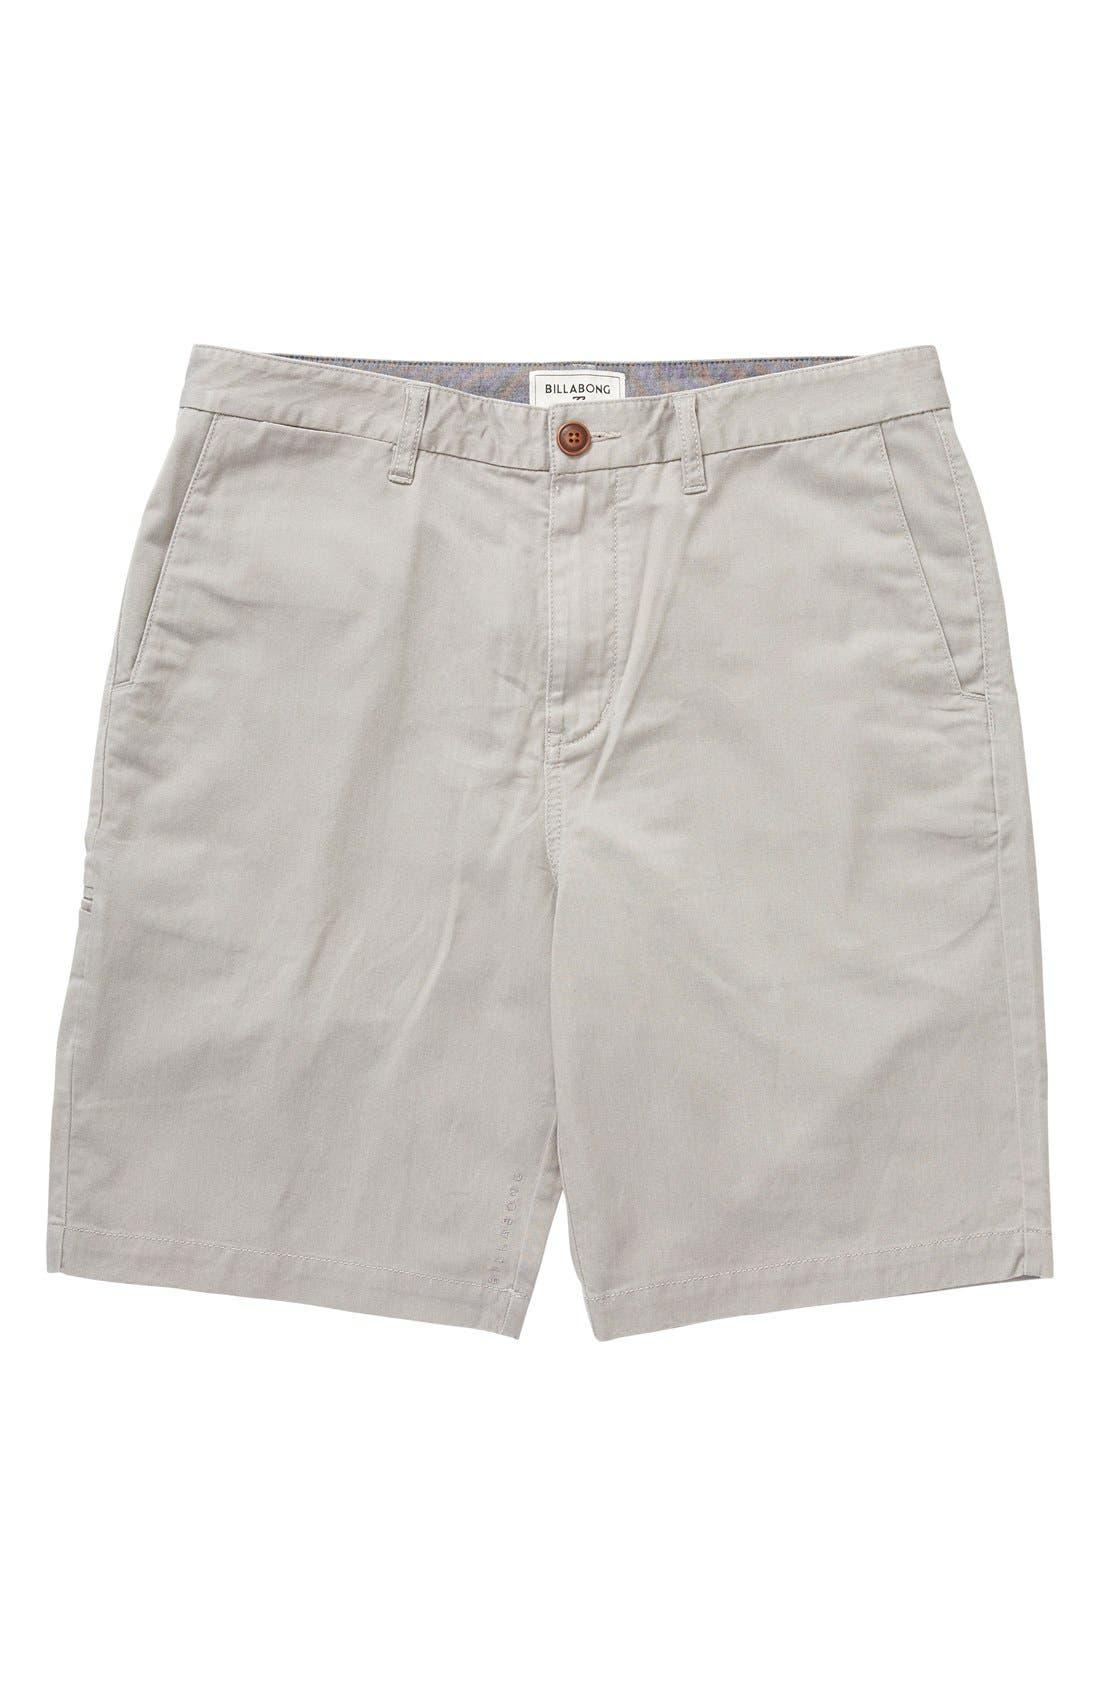 'Carter' Cotton Twill Shorts,                             Main thumbnail 1, color,                             Grey Heather